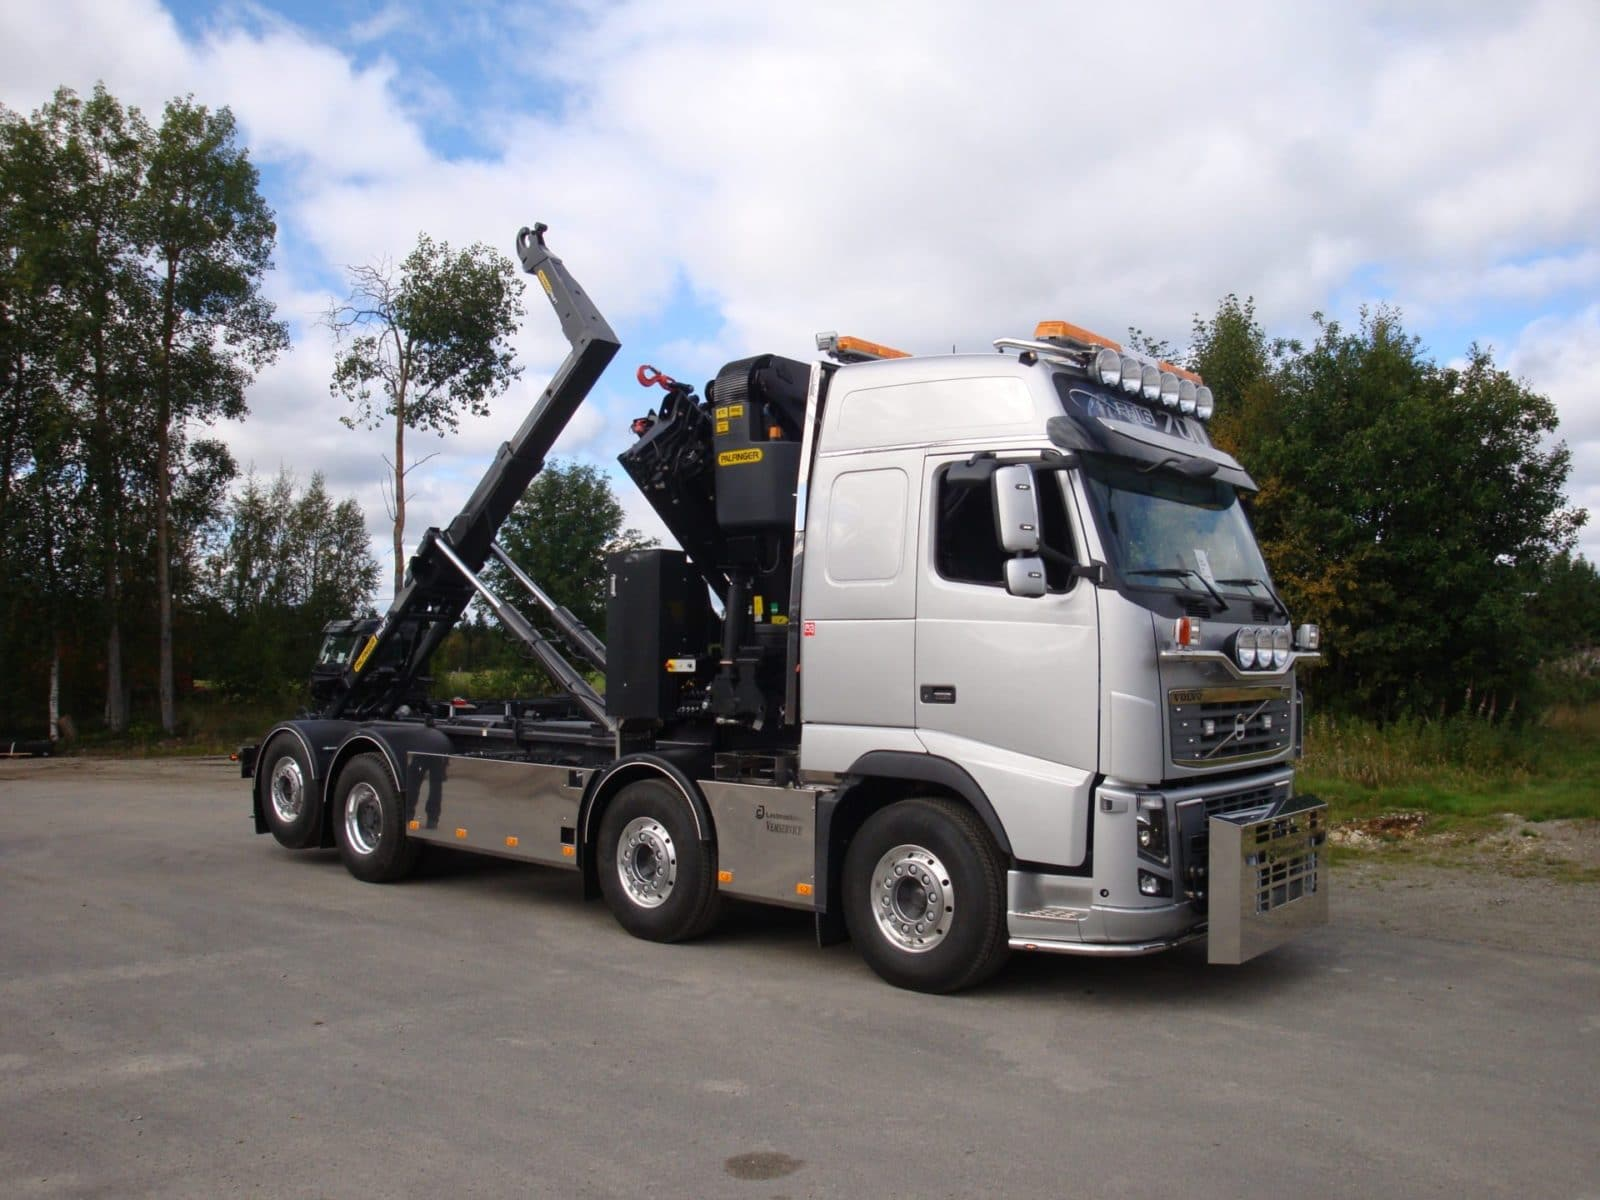 1023315-cj-lastmaskiner-24